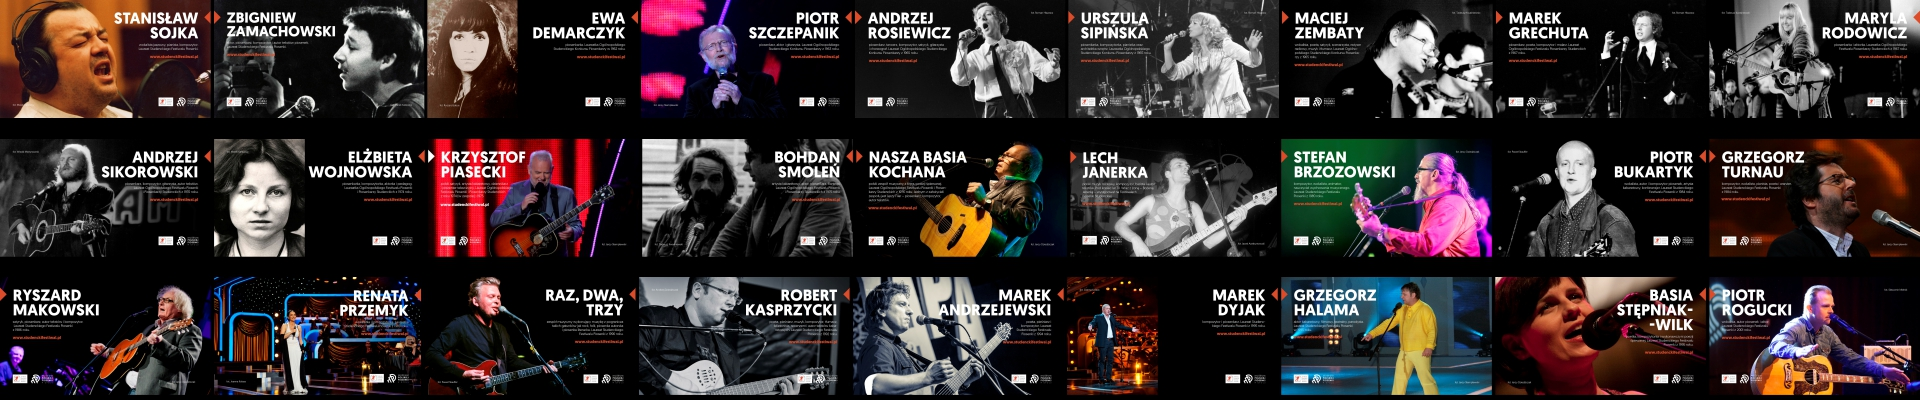 55. Studencki Festiwal Piosenki - Krakowski Festiwal Piosenki